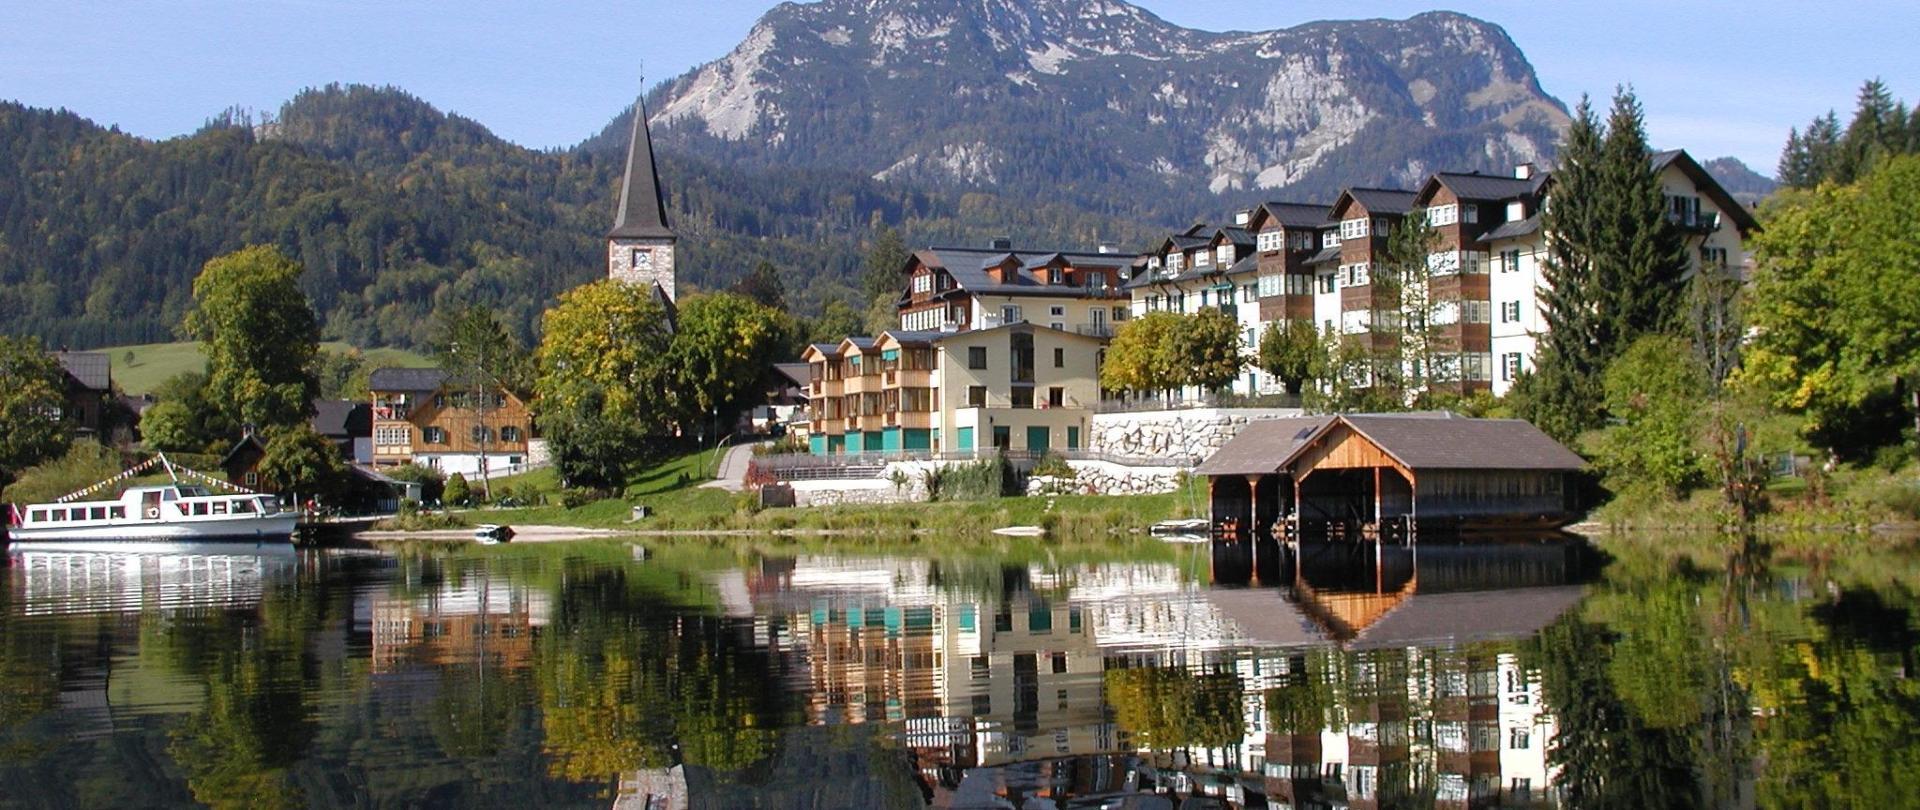 Hotel am See - Seeresidenz